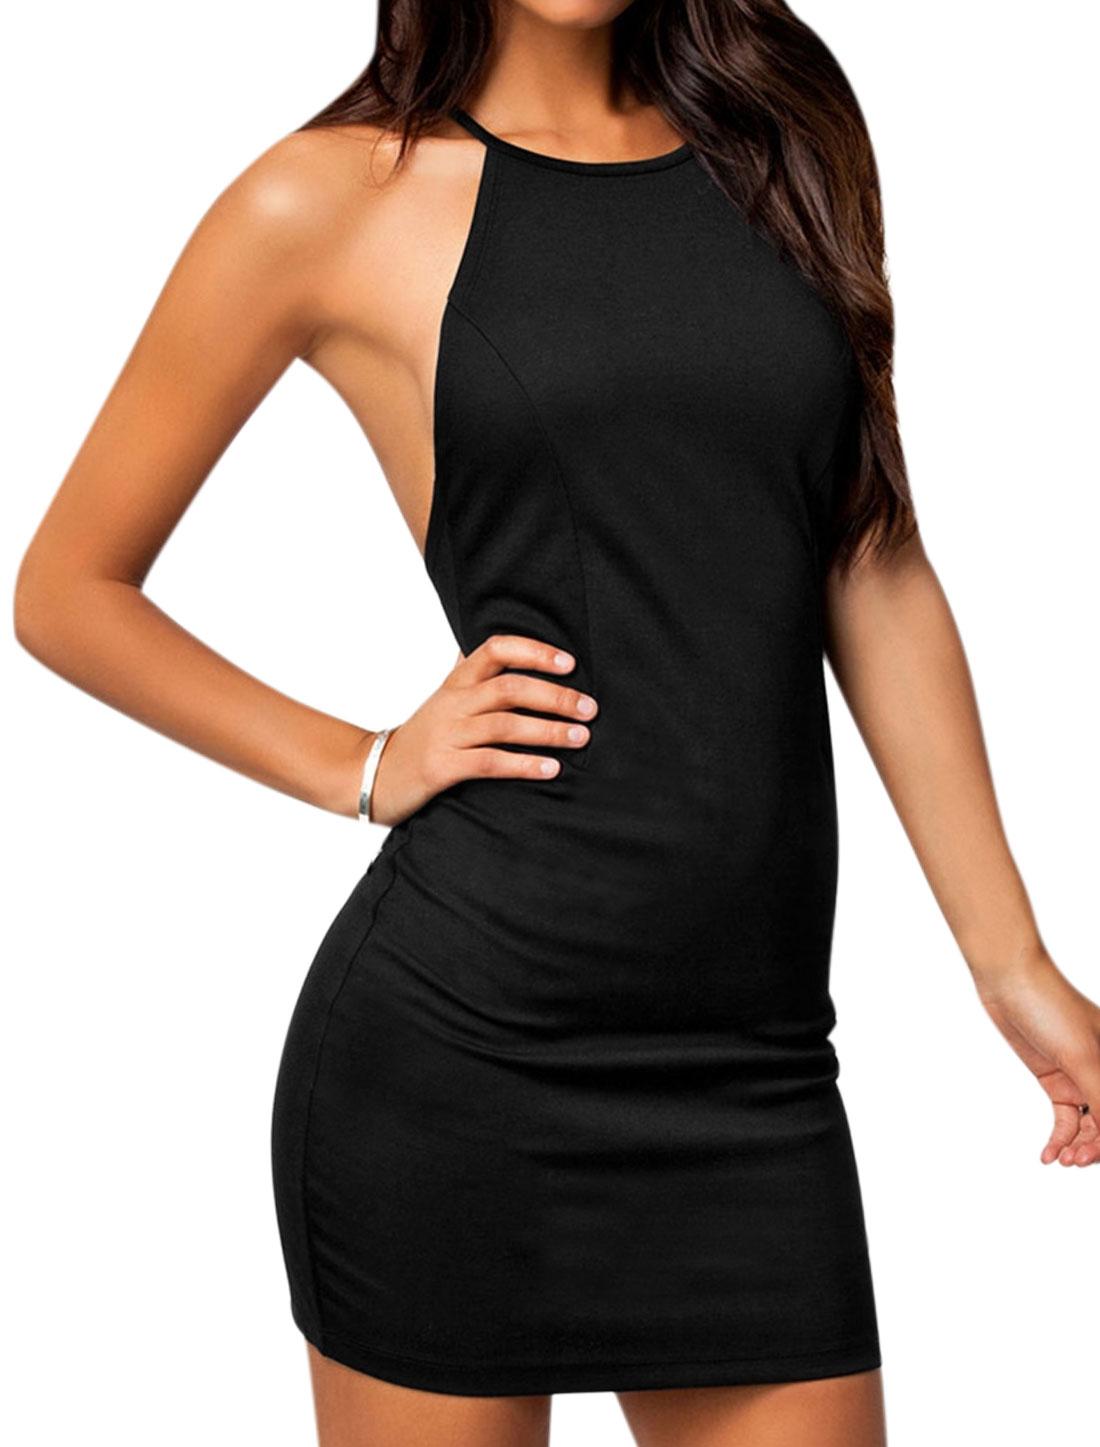 Women Halter Neck Cross Back Bodycon Mini Dress Black M